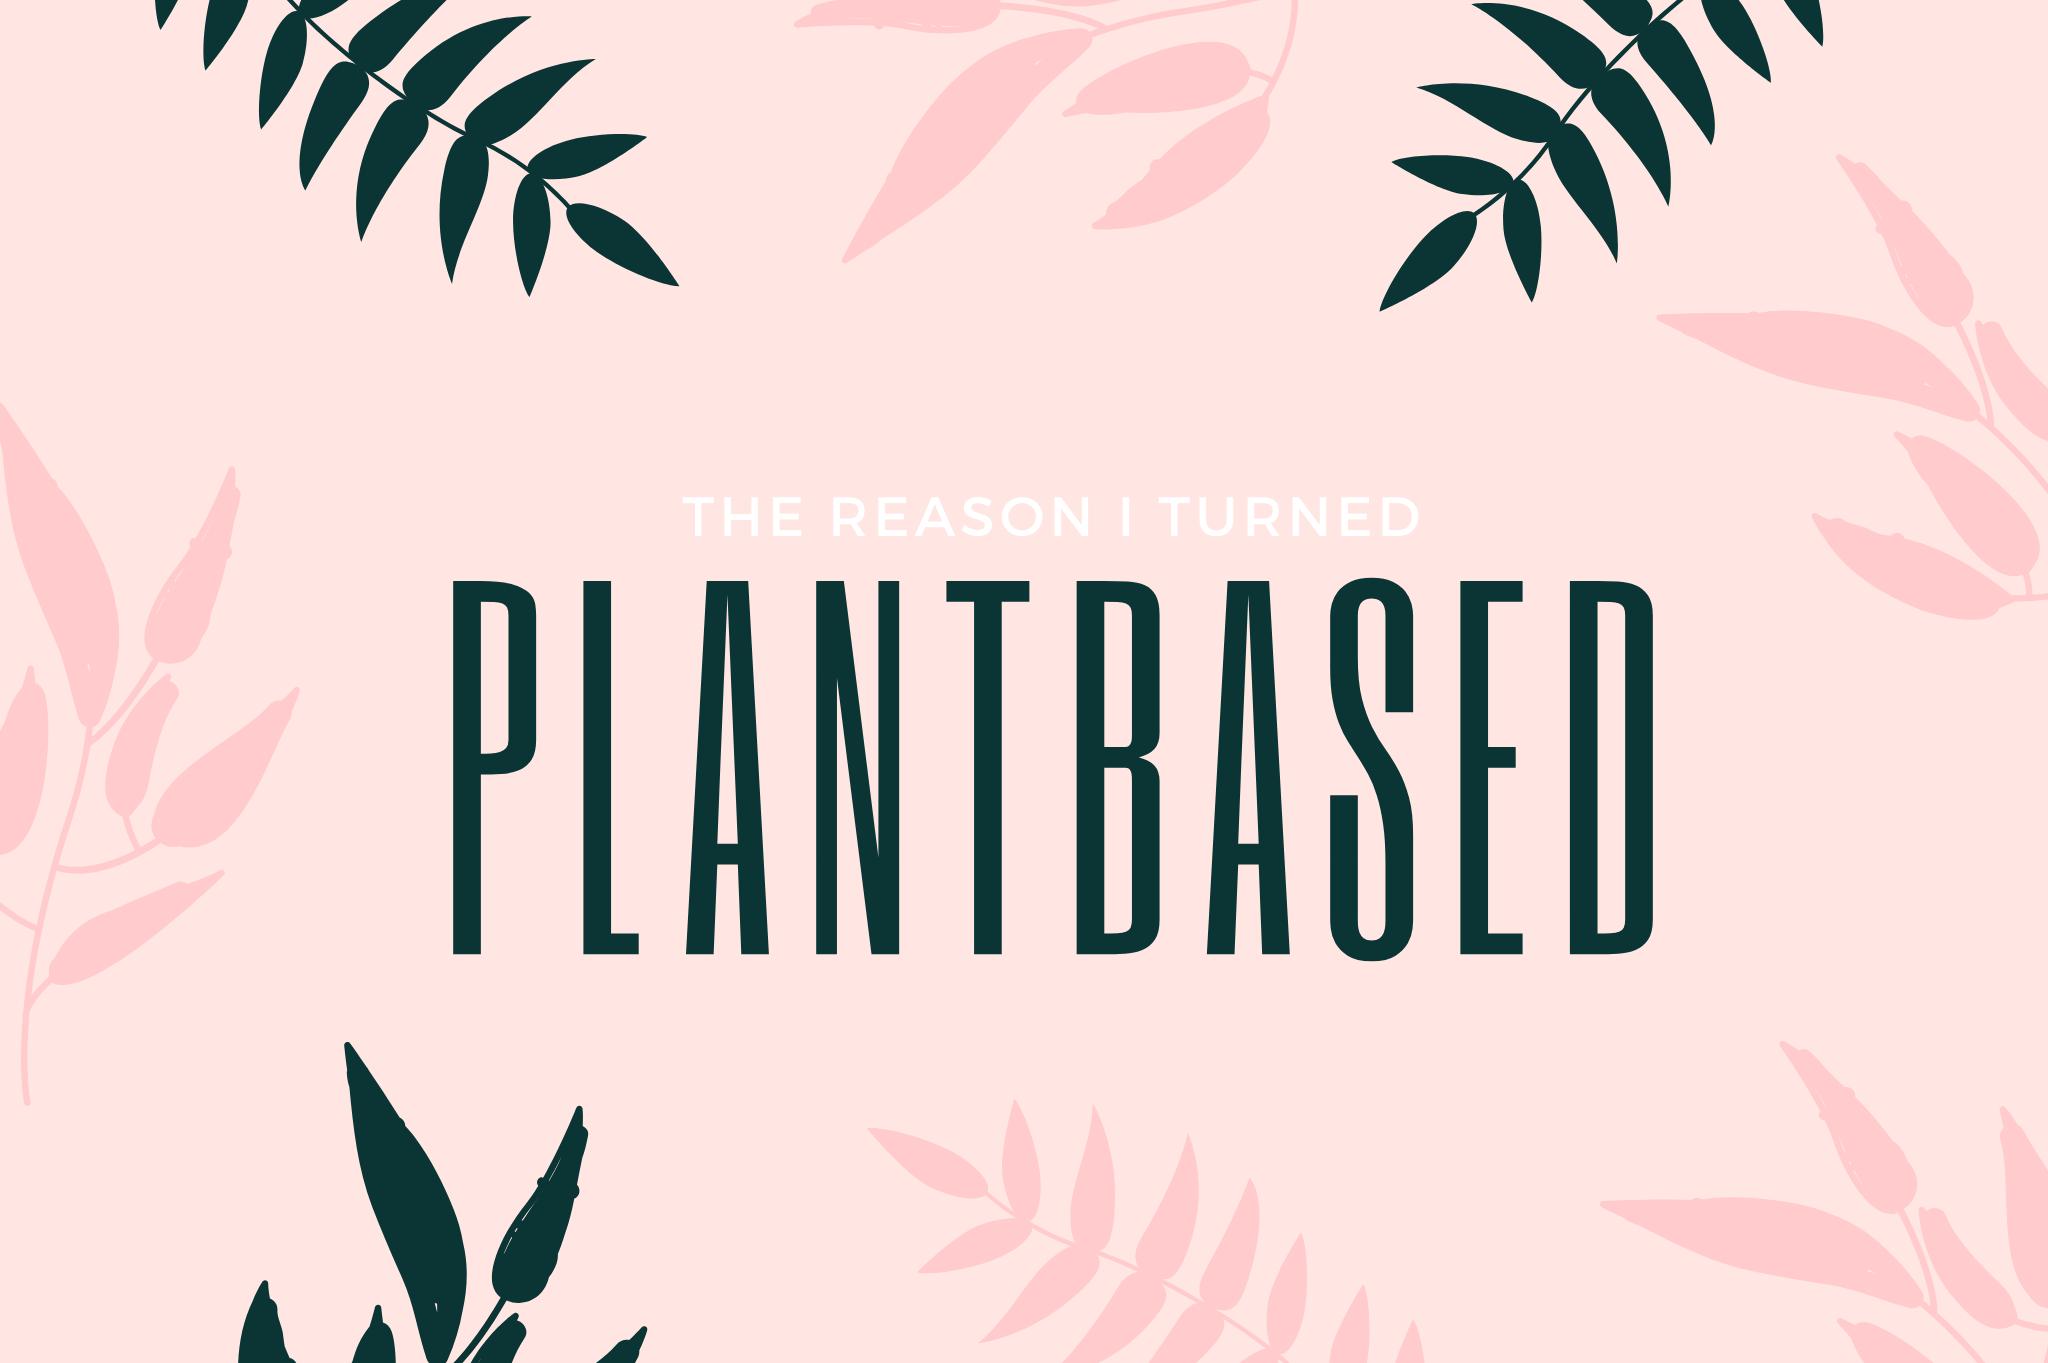 plantbased diet vegan veganism why to go vegan why i went wegan why i went plantbased